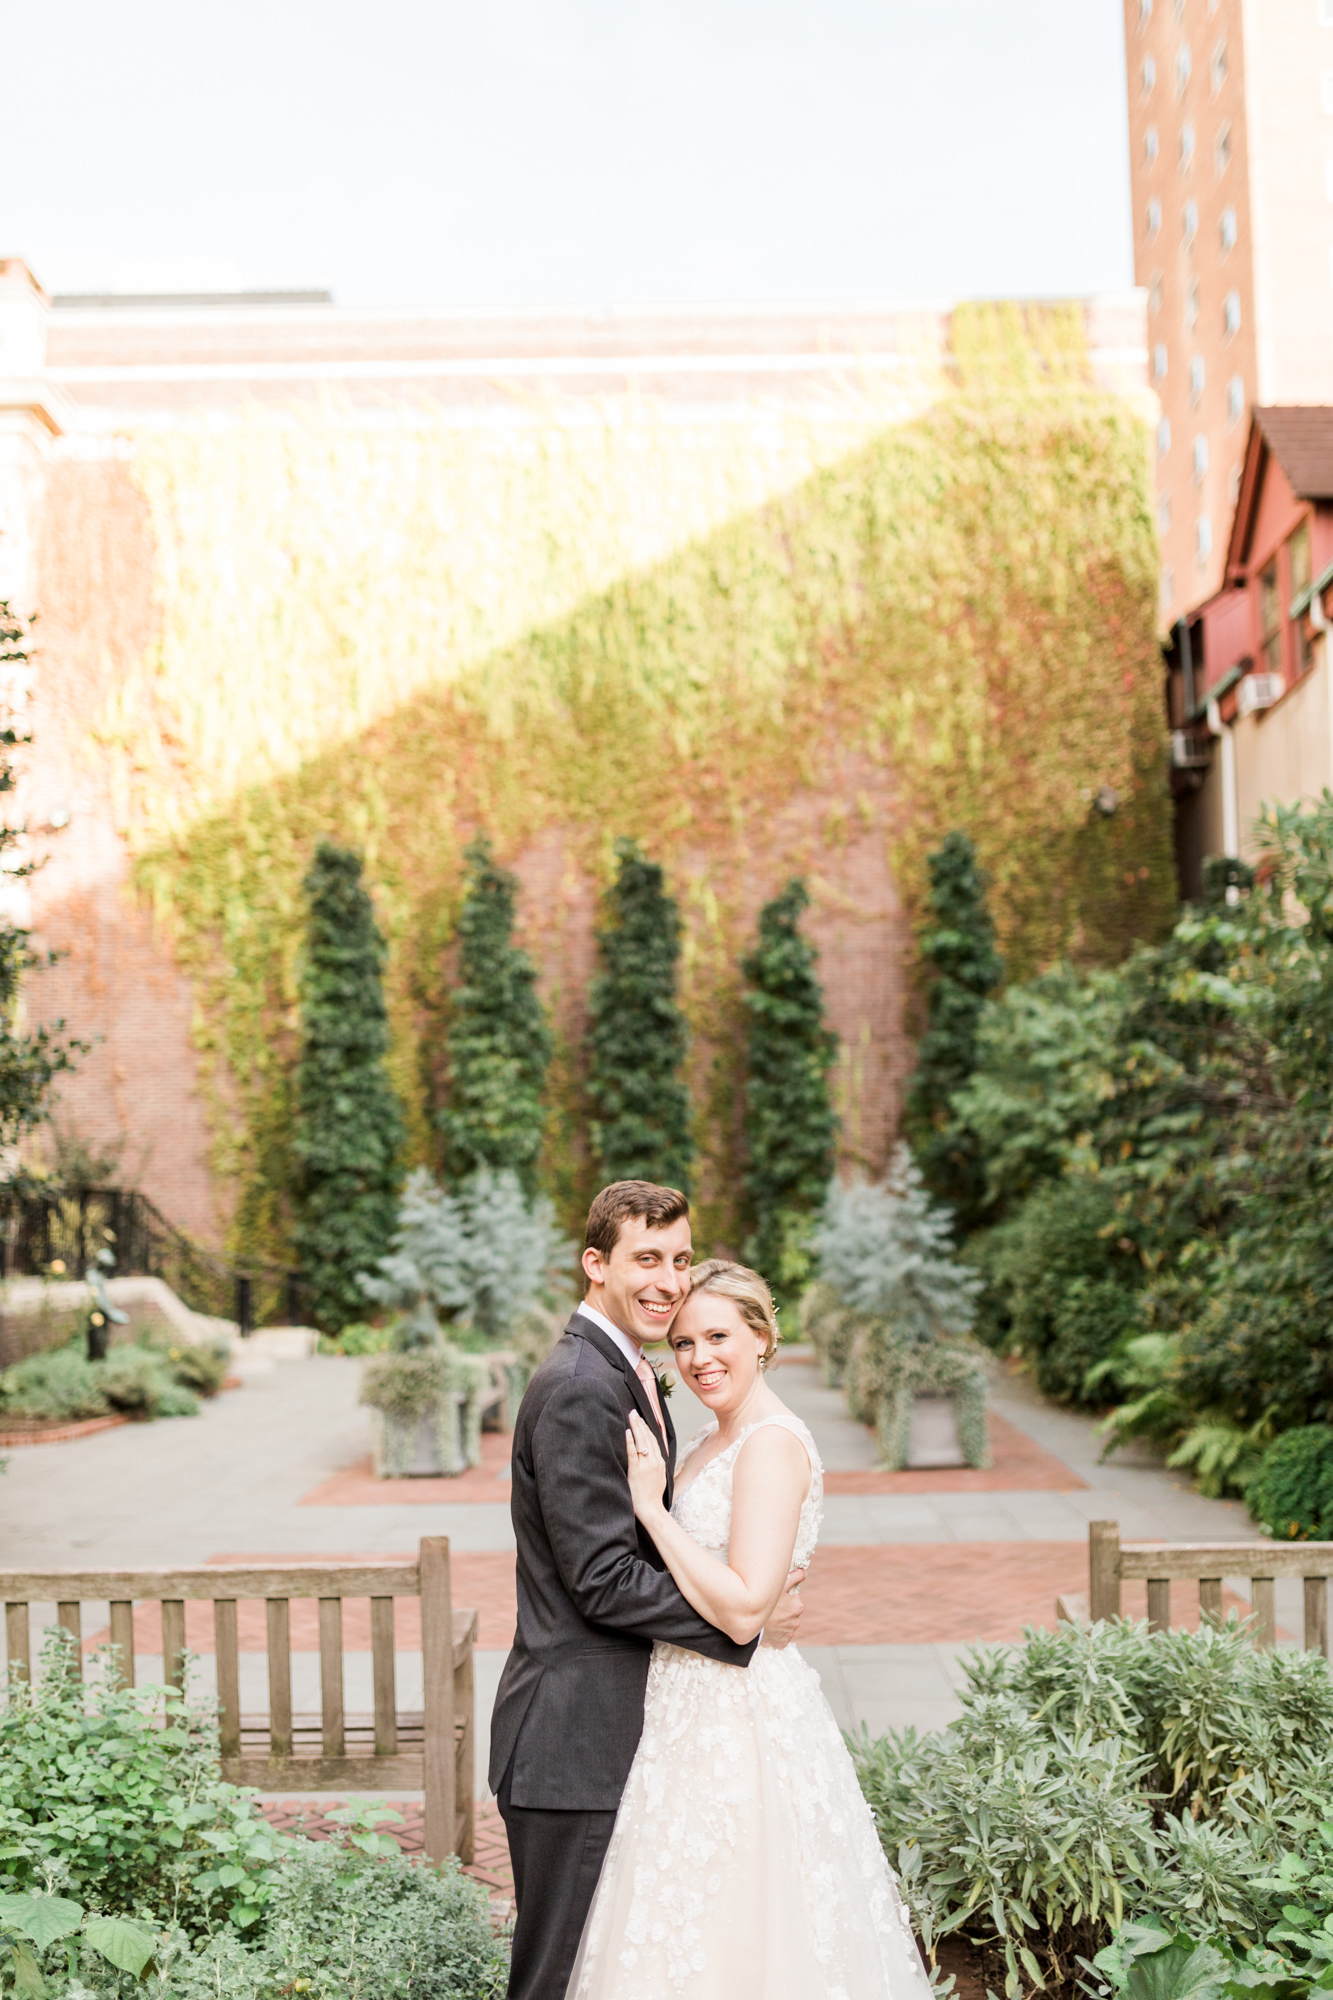 haley-richter-photography-autumn-college-of-physicians-wedding-philadelphia--123.jpg